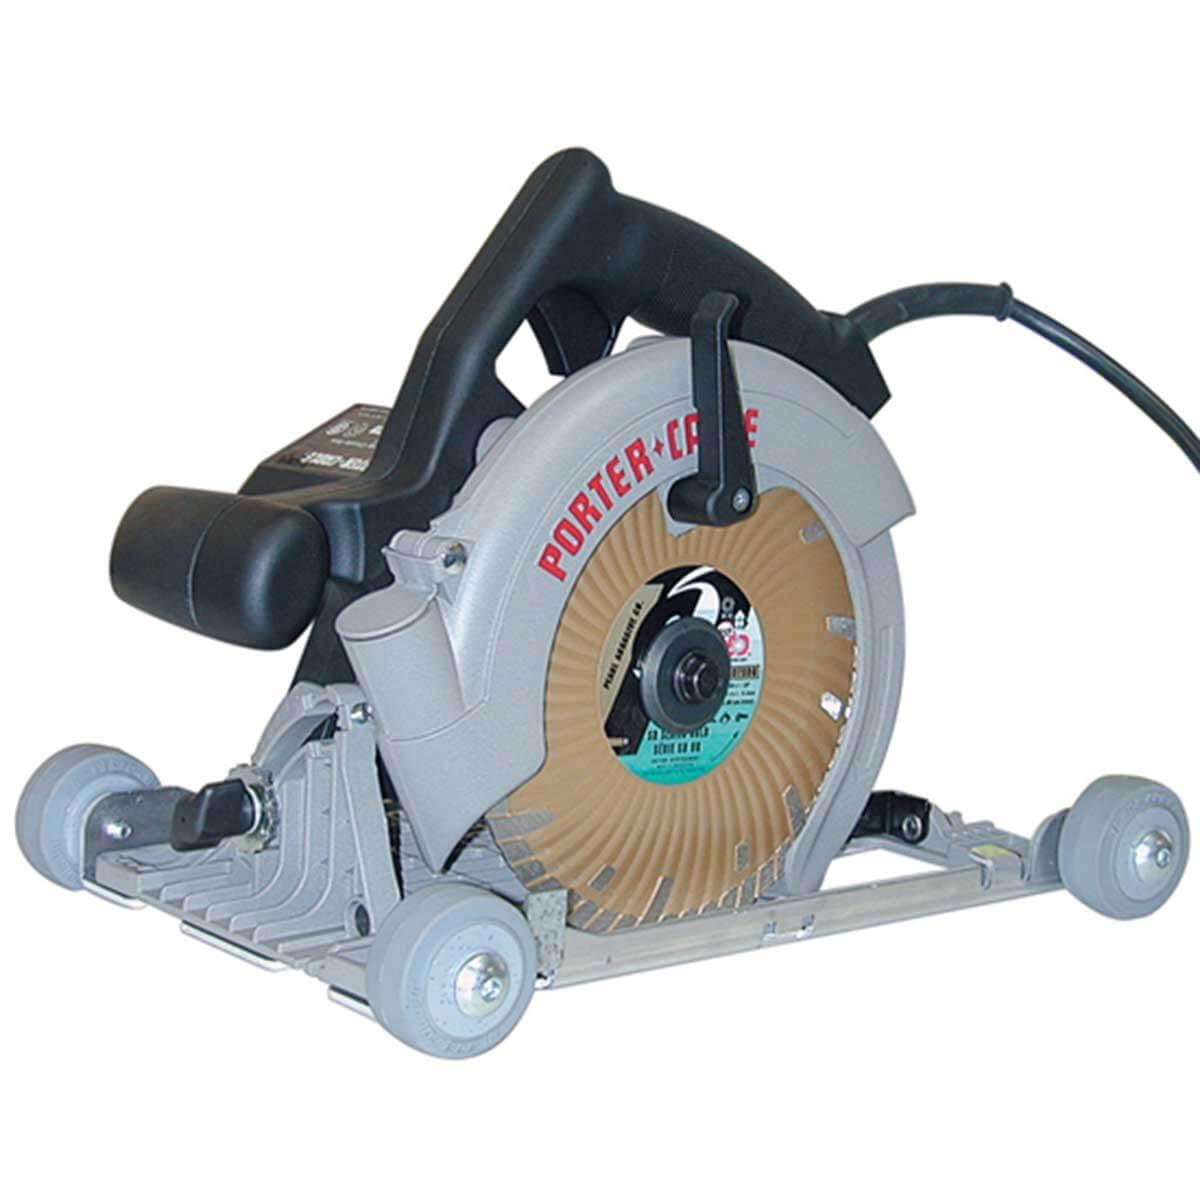 Pearl Sidewinder circular saw